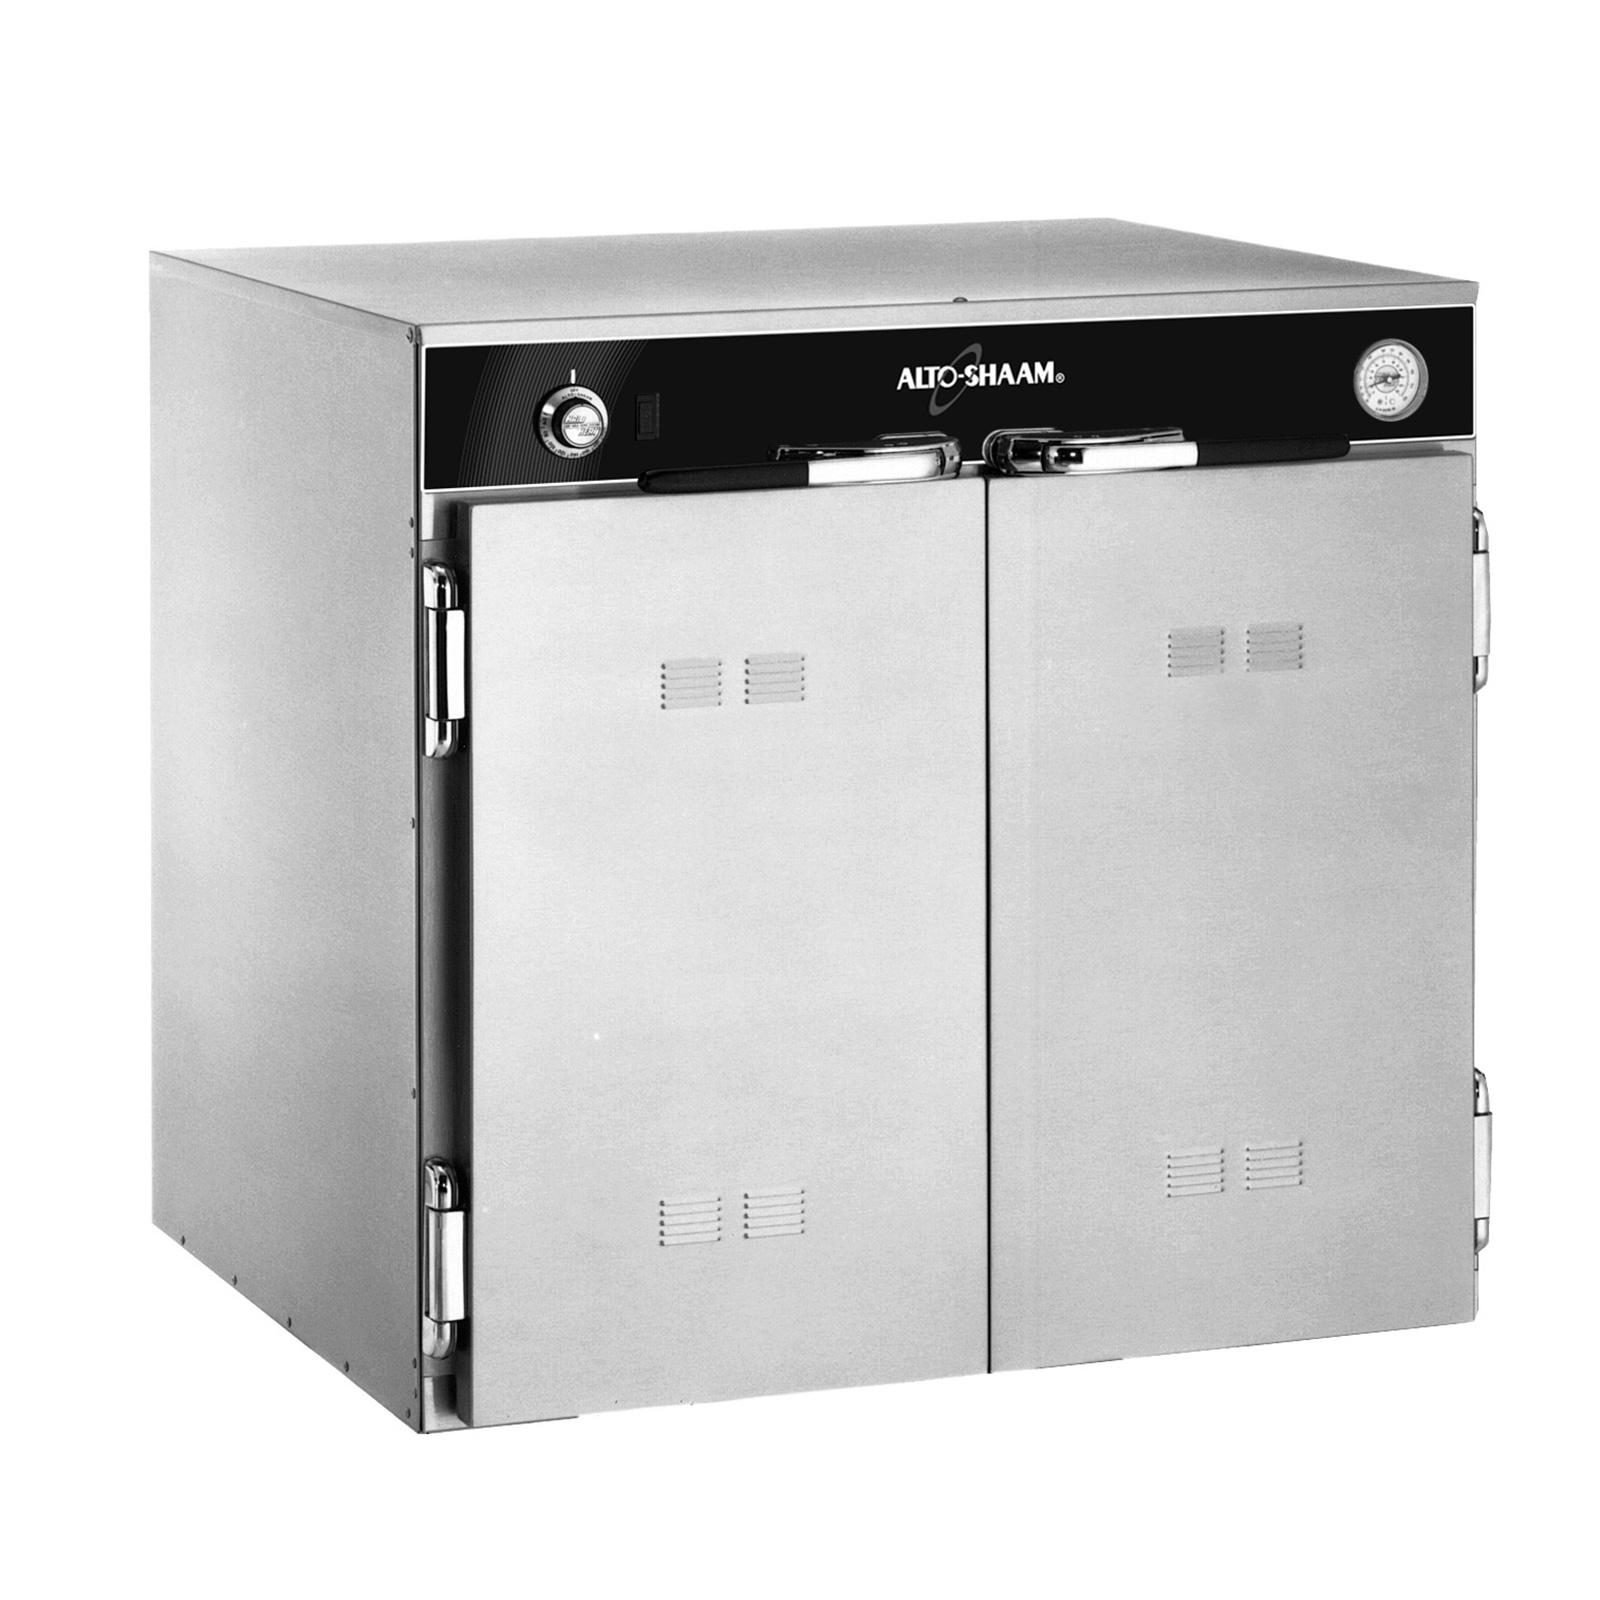 Alto-Shaam 750-CTUS heated cabinet, reach-in